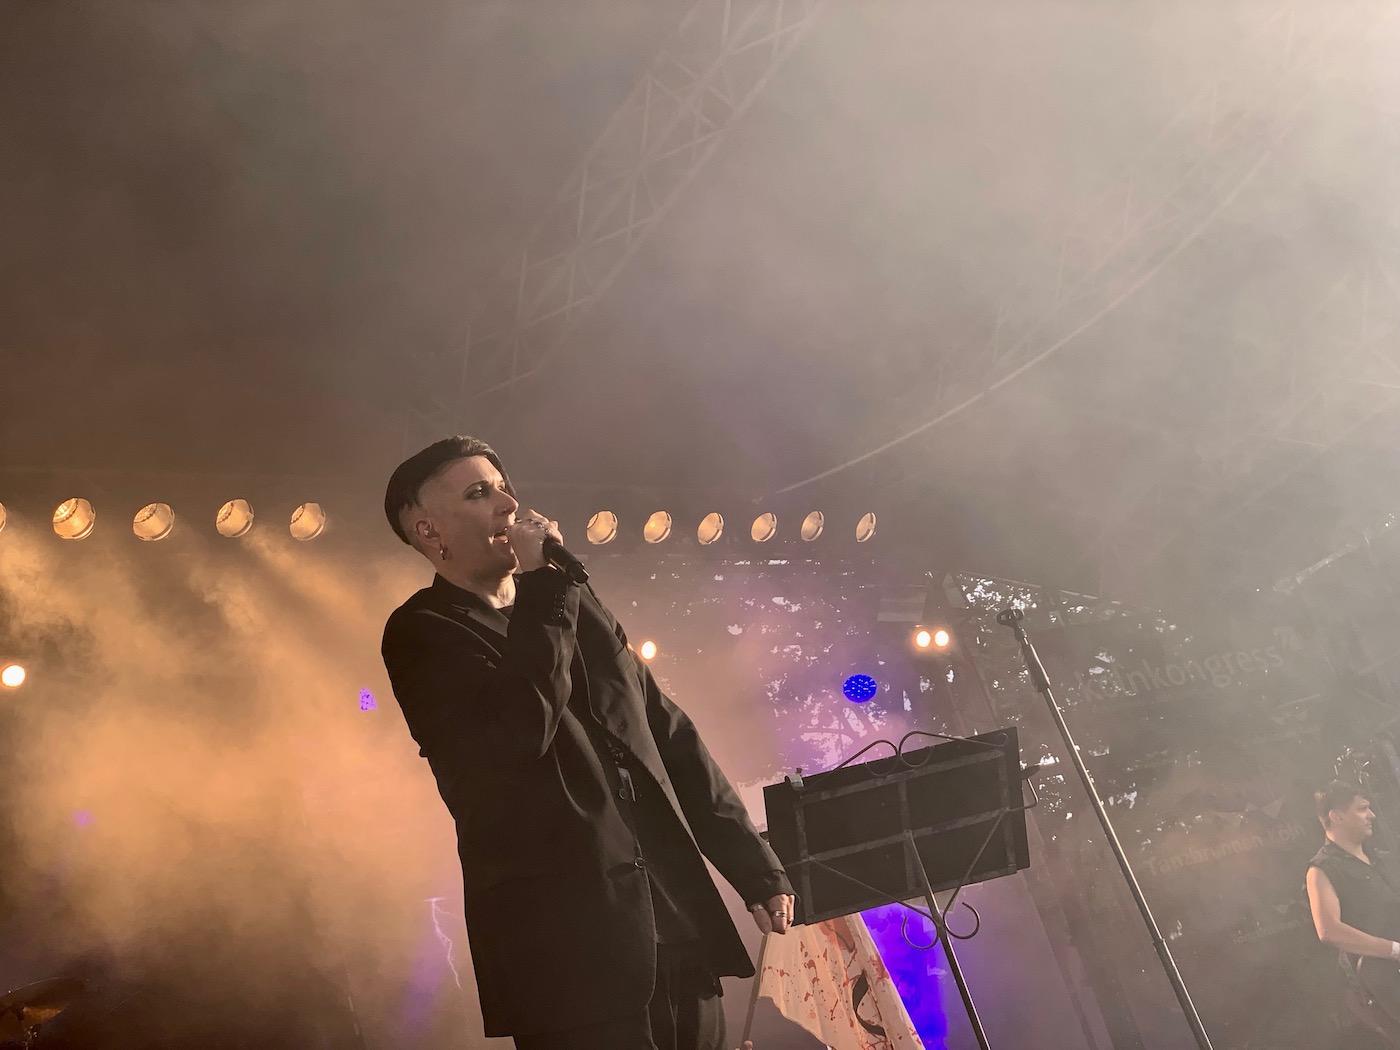 mark_benecke_amphi_festival_koeln_2019 - 111.jpg